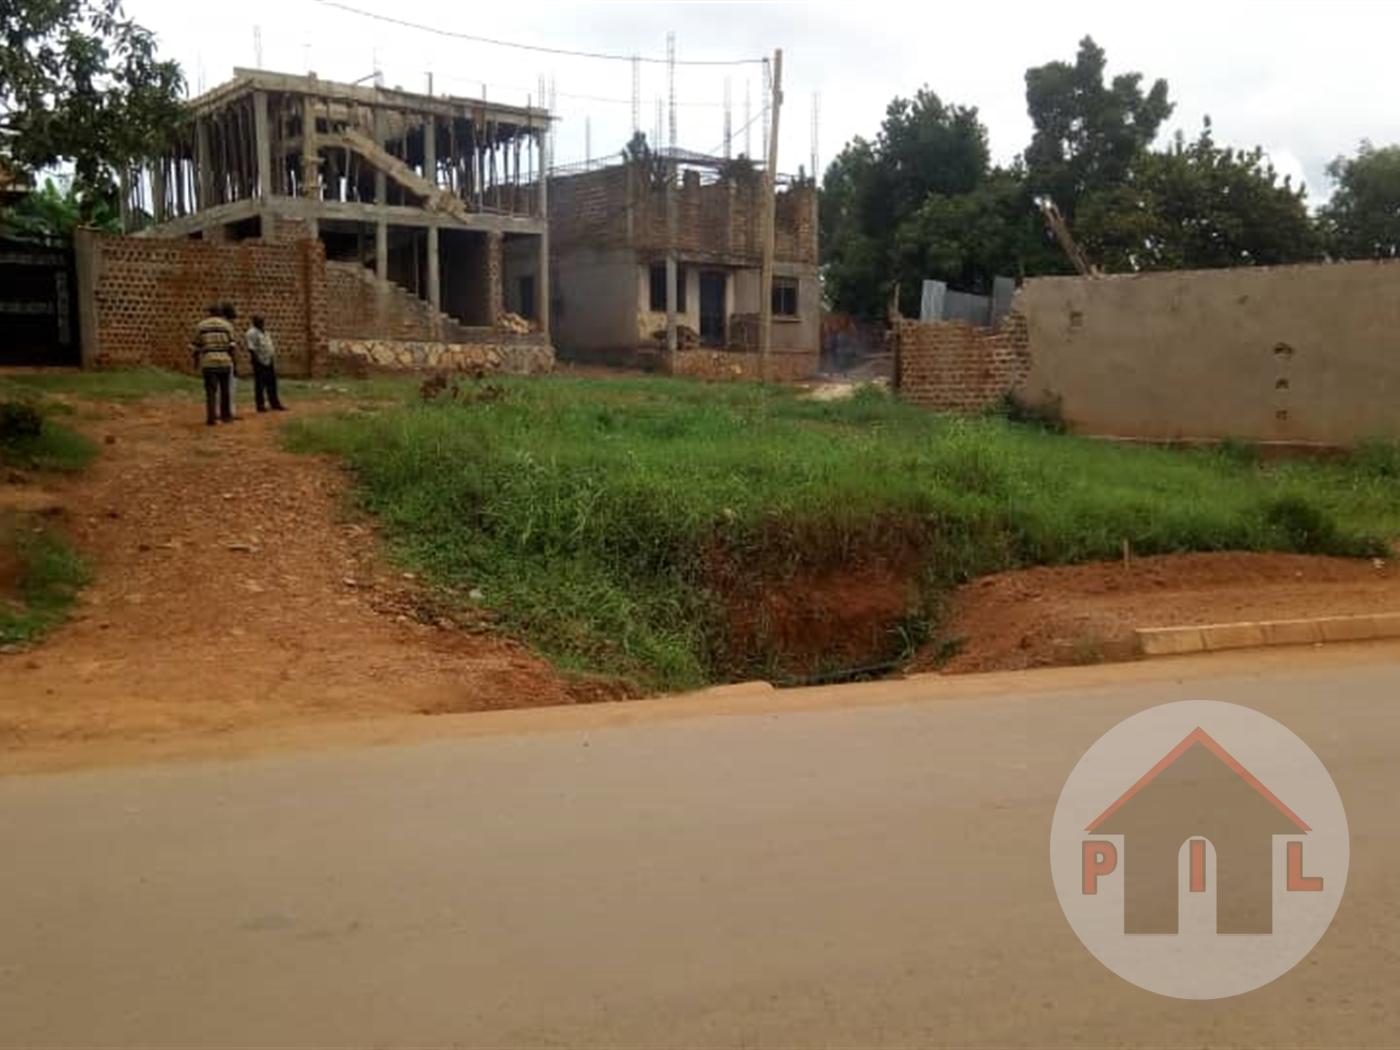 Commercial Land for sale in Kanyanya Kampala